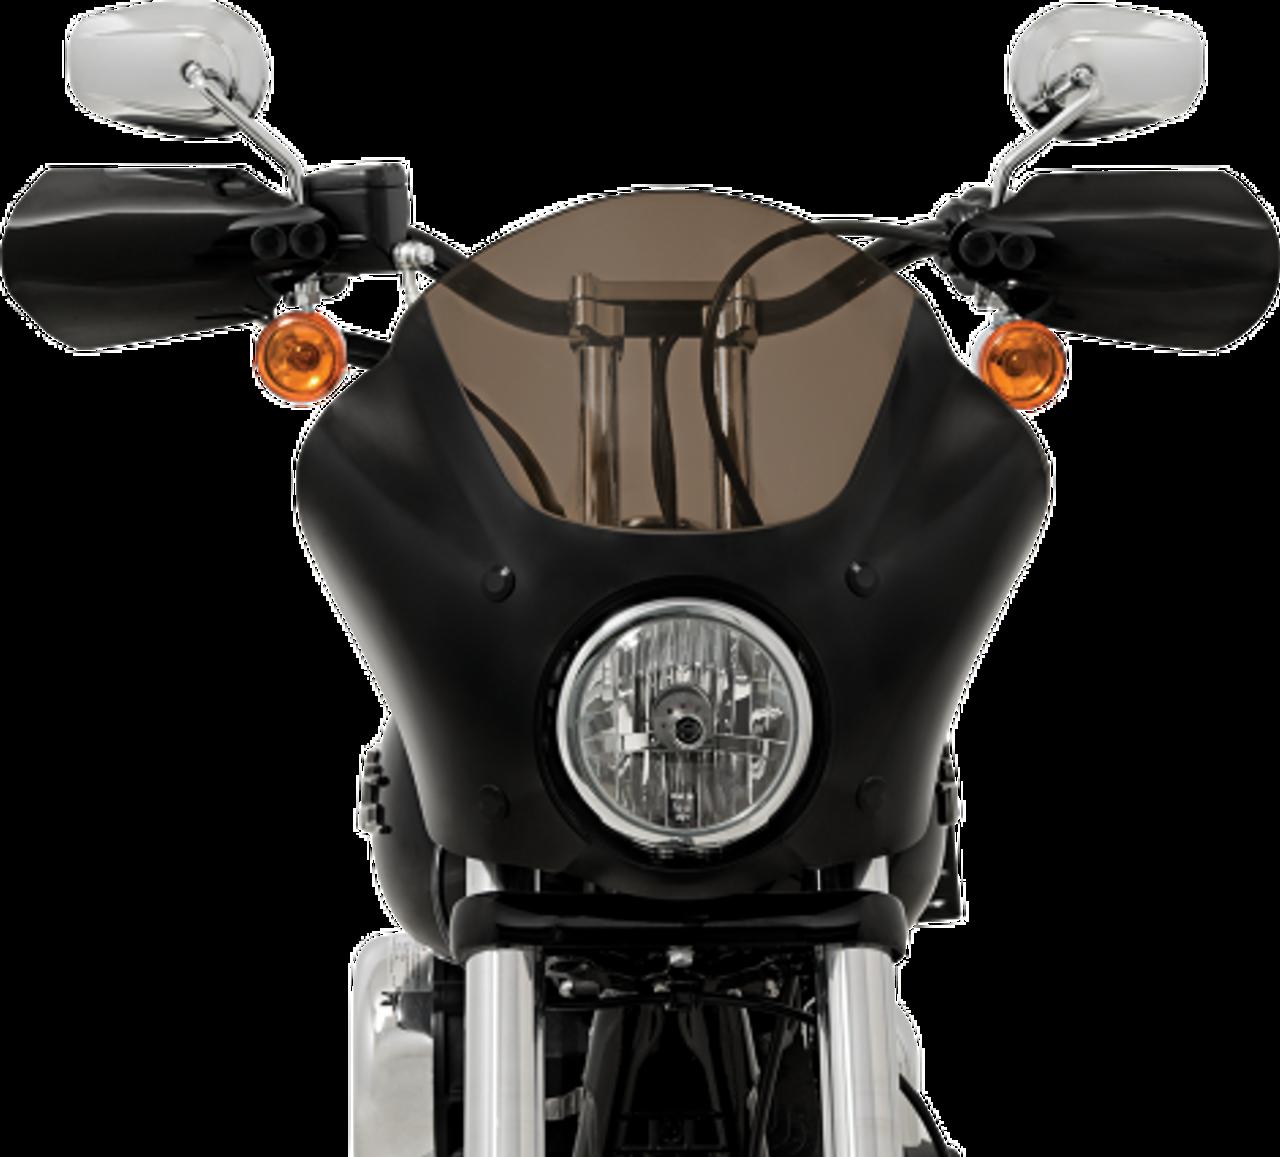 Black Memphis Shades Headlight Extension Block Dual Headlight for 08-17 Harley FXDF